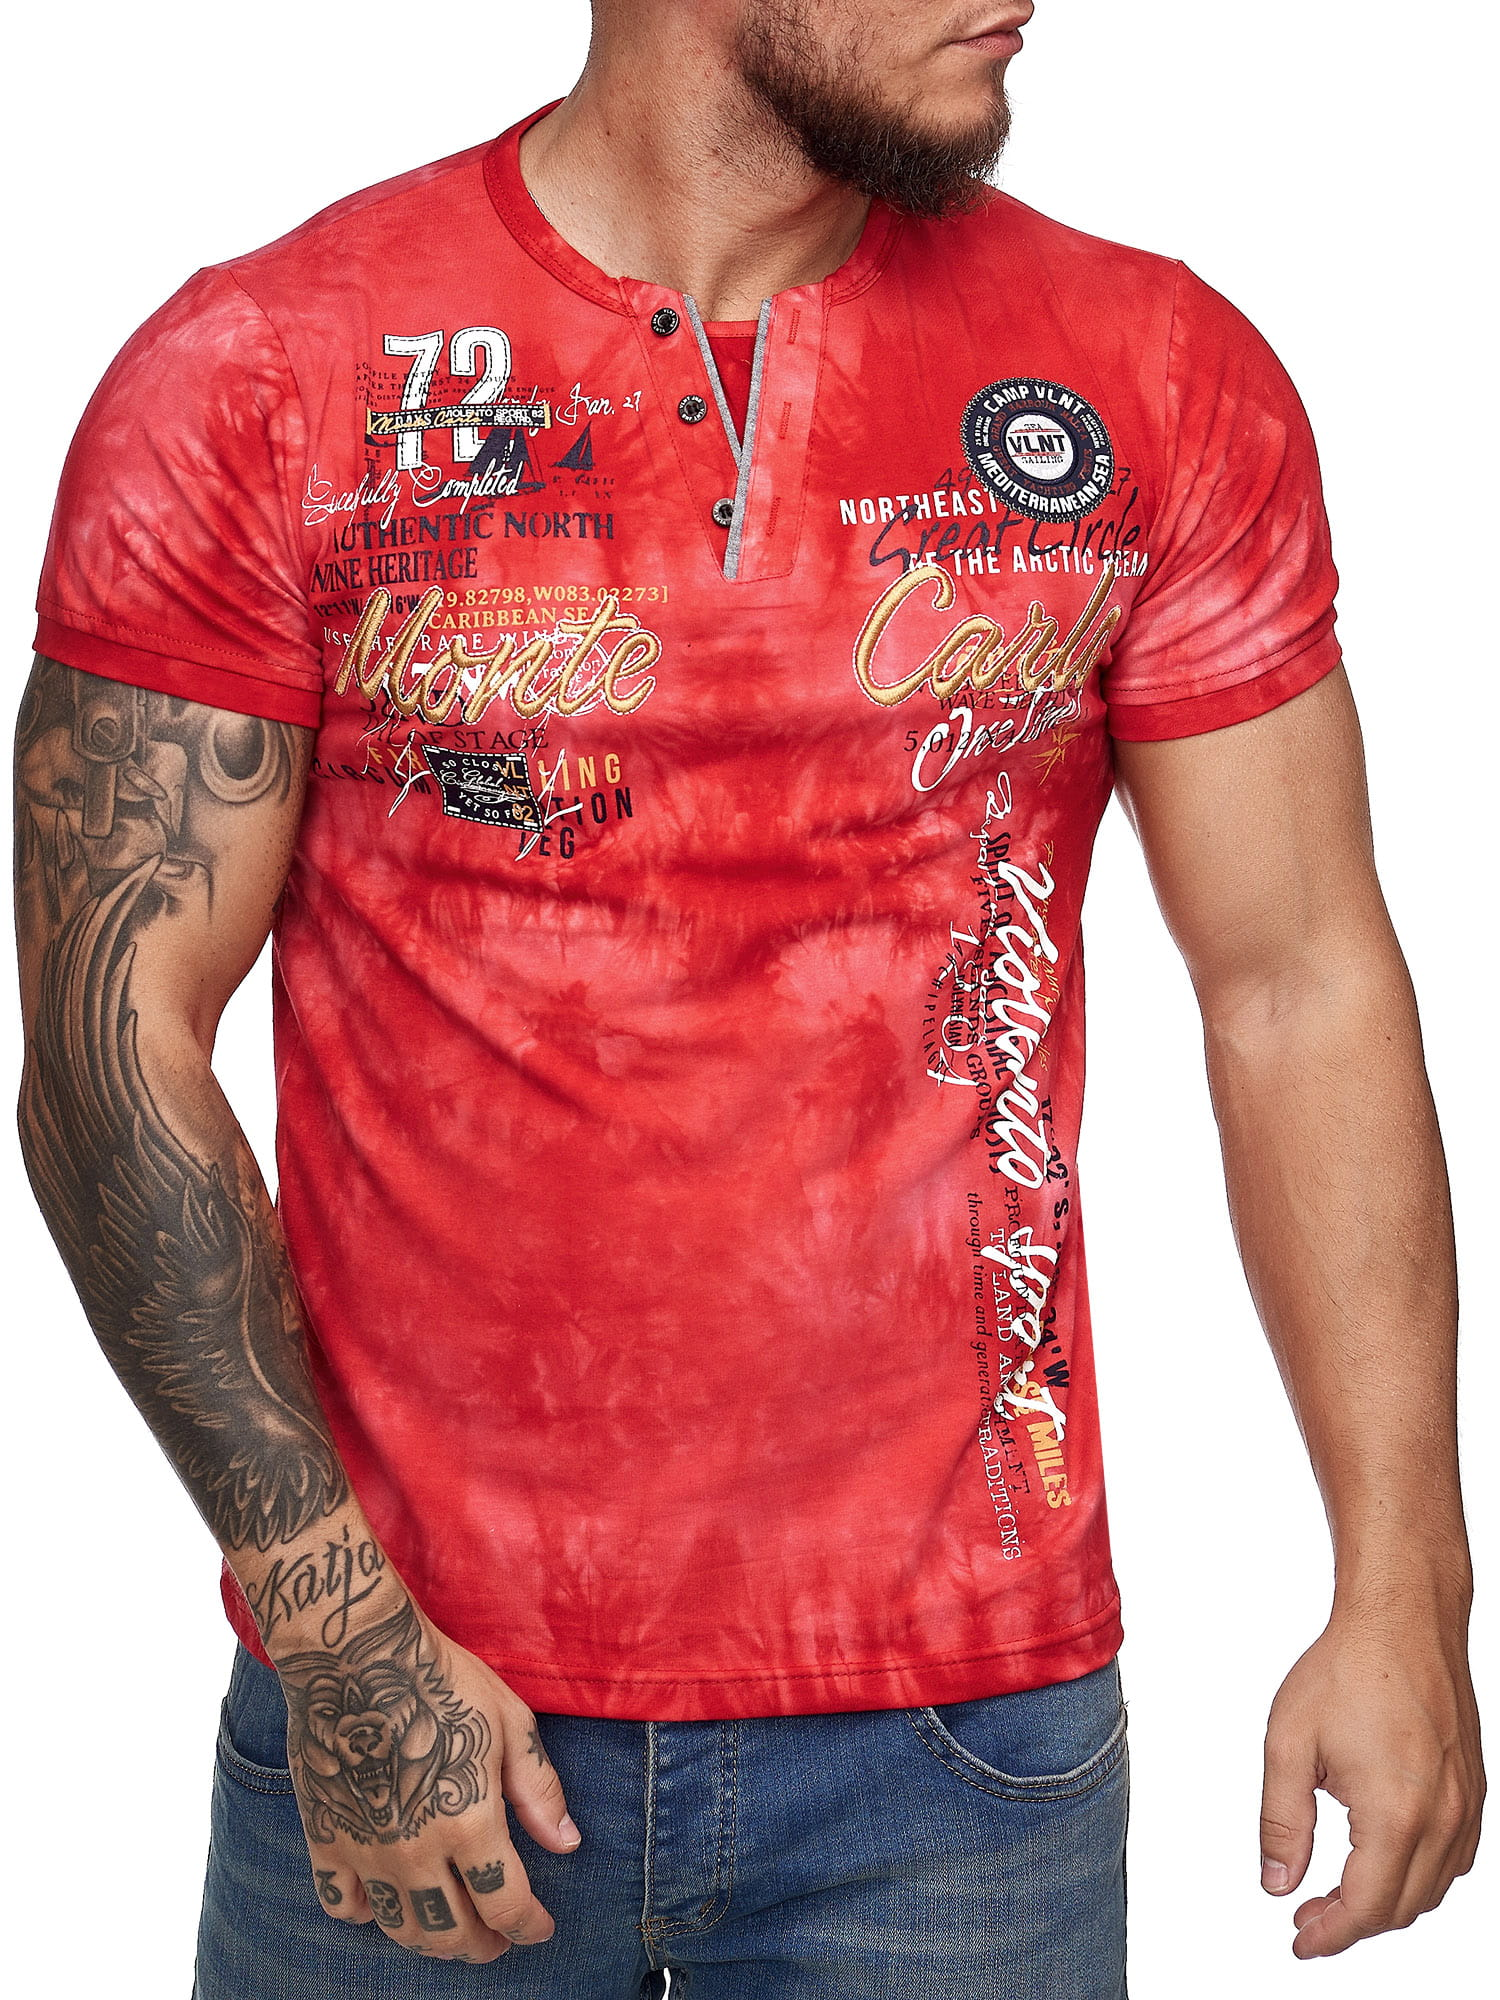 Herren T Shirt Poloshirt Shirt Kurzarm Printshirt Polo Kurzarm 3DS8